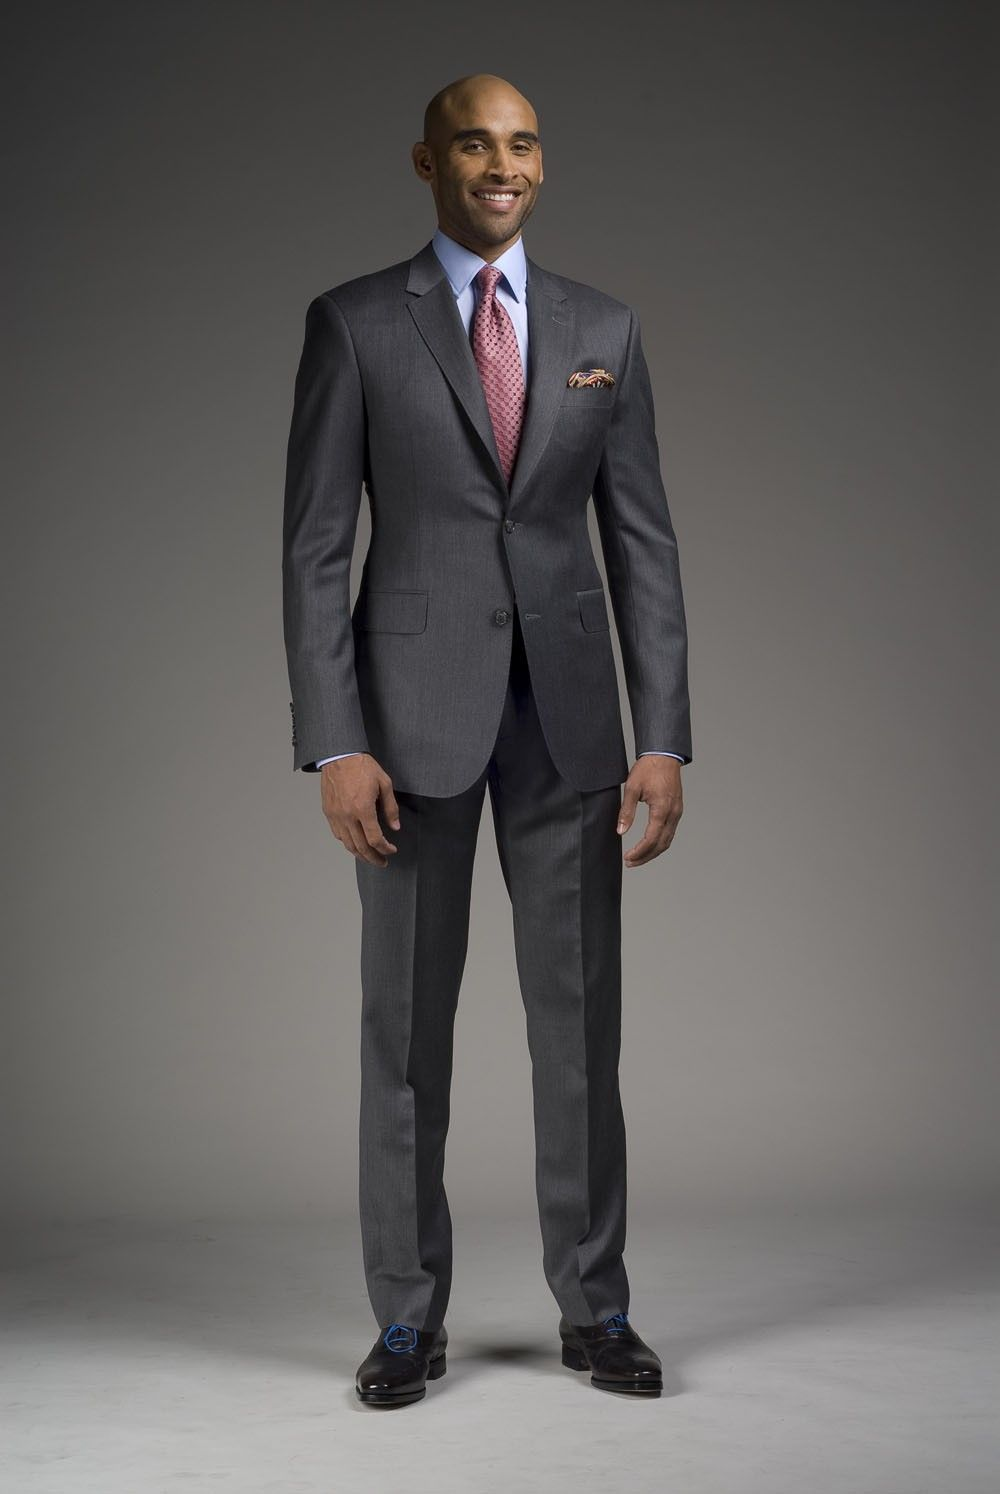 The Professional Suit - Suits & Blazers